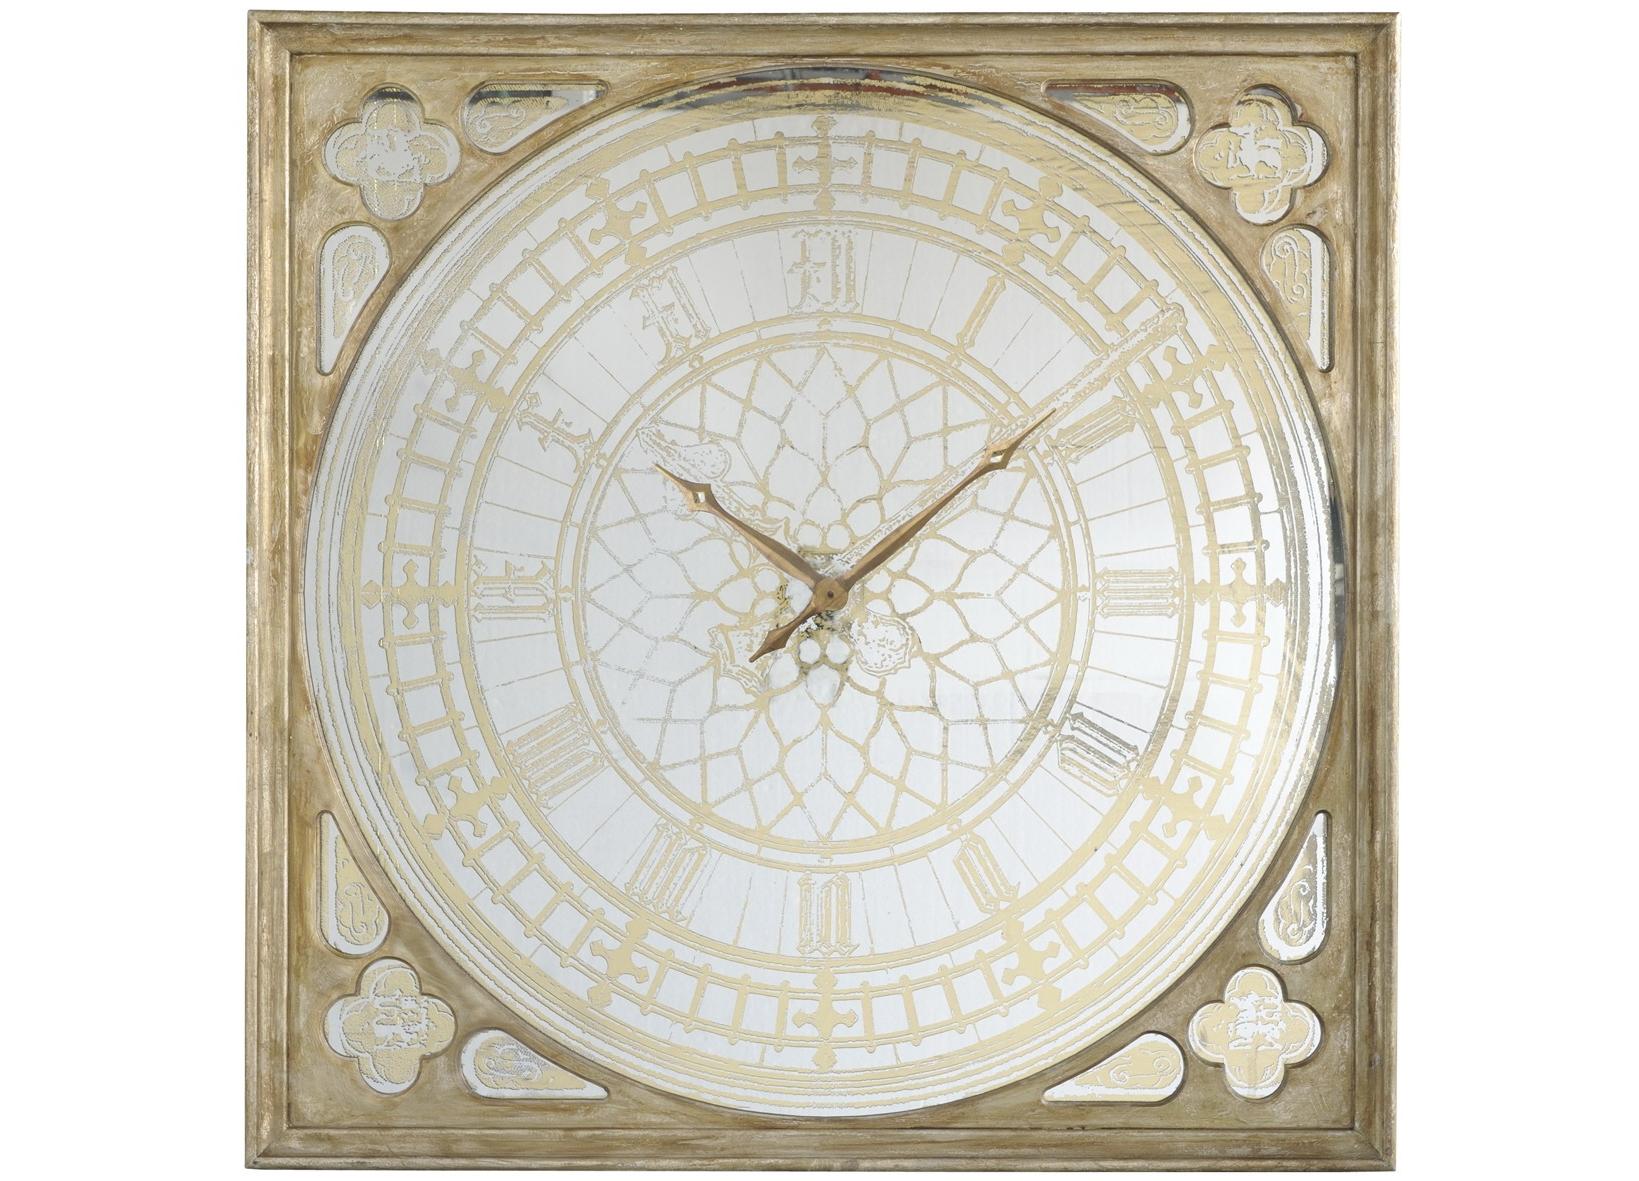 Часы настенныеНастенные часы<br>Часы настенные с зеркальным патинированным покрытием&amp;lt;div&amp;gt;Вес 26 кг&amp;lt;/div&amp;gt;<br><br>Material: Дерево<br>Width см: 125<br>Depth см: 6,5<br>Height см: 125